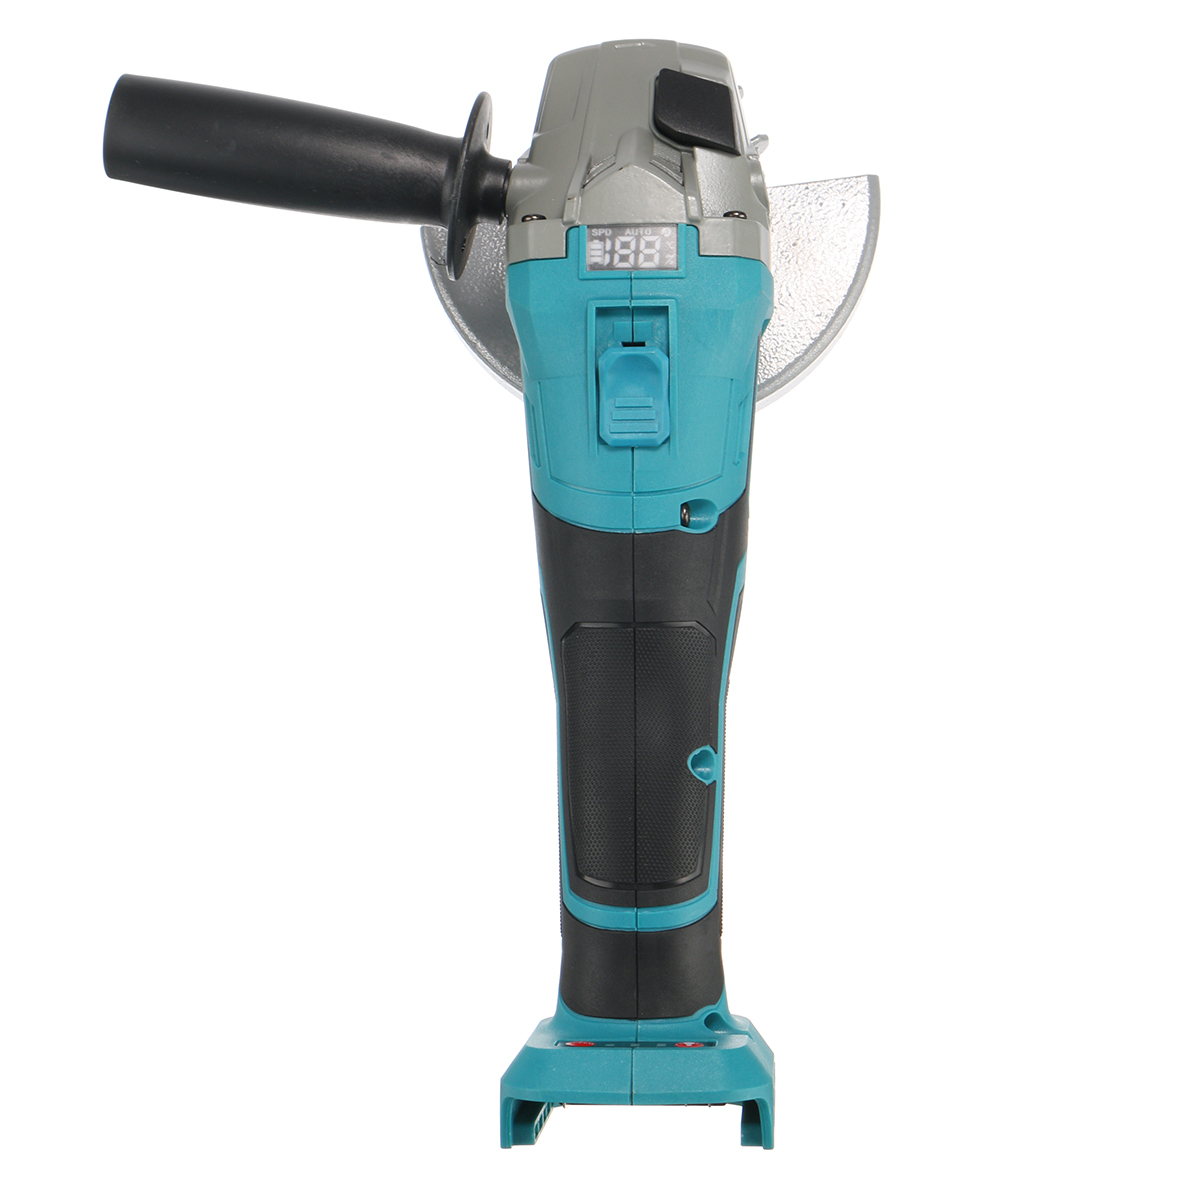 125mm Brushless Cordless Angle Grinder Polishing Cutting Machine Adapted to 18V Makita Battery